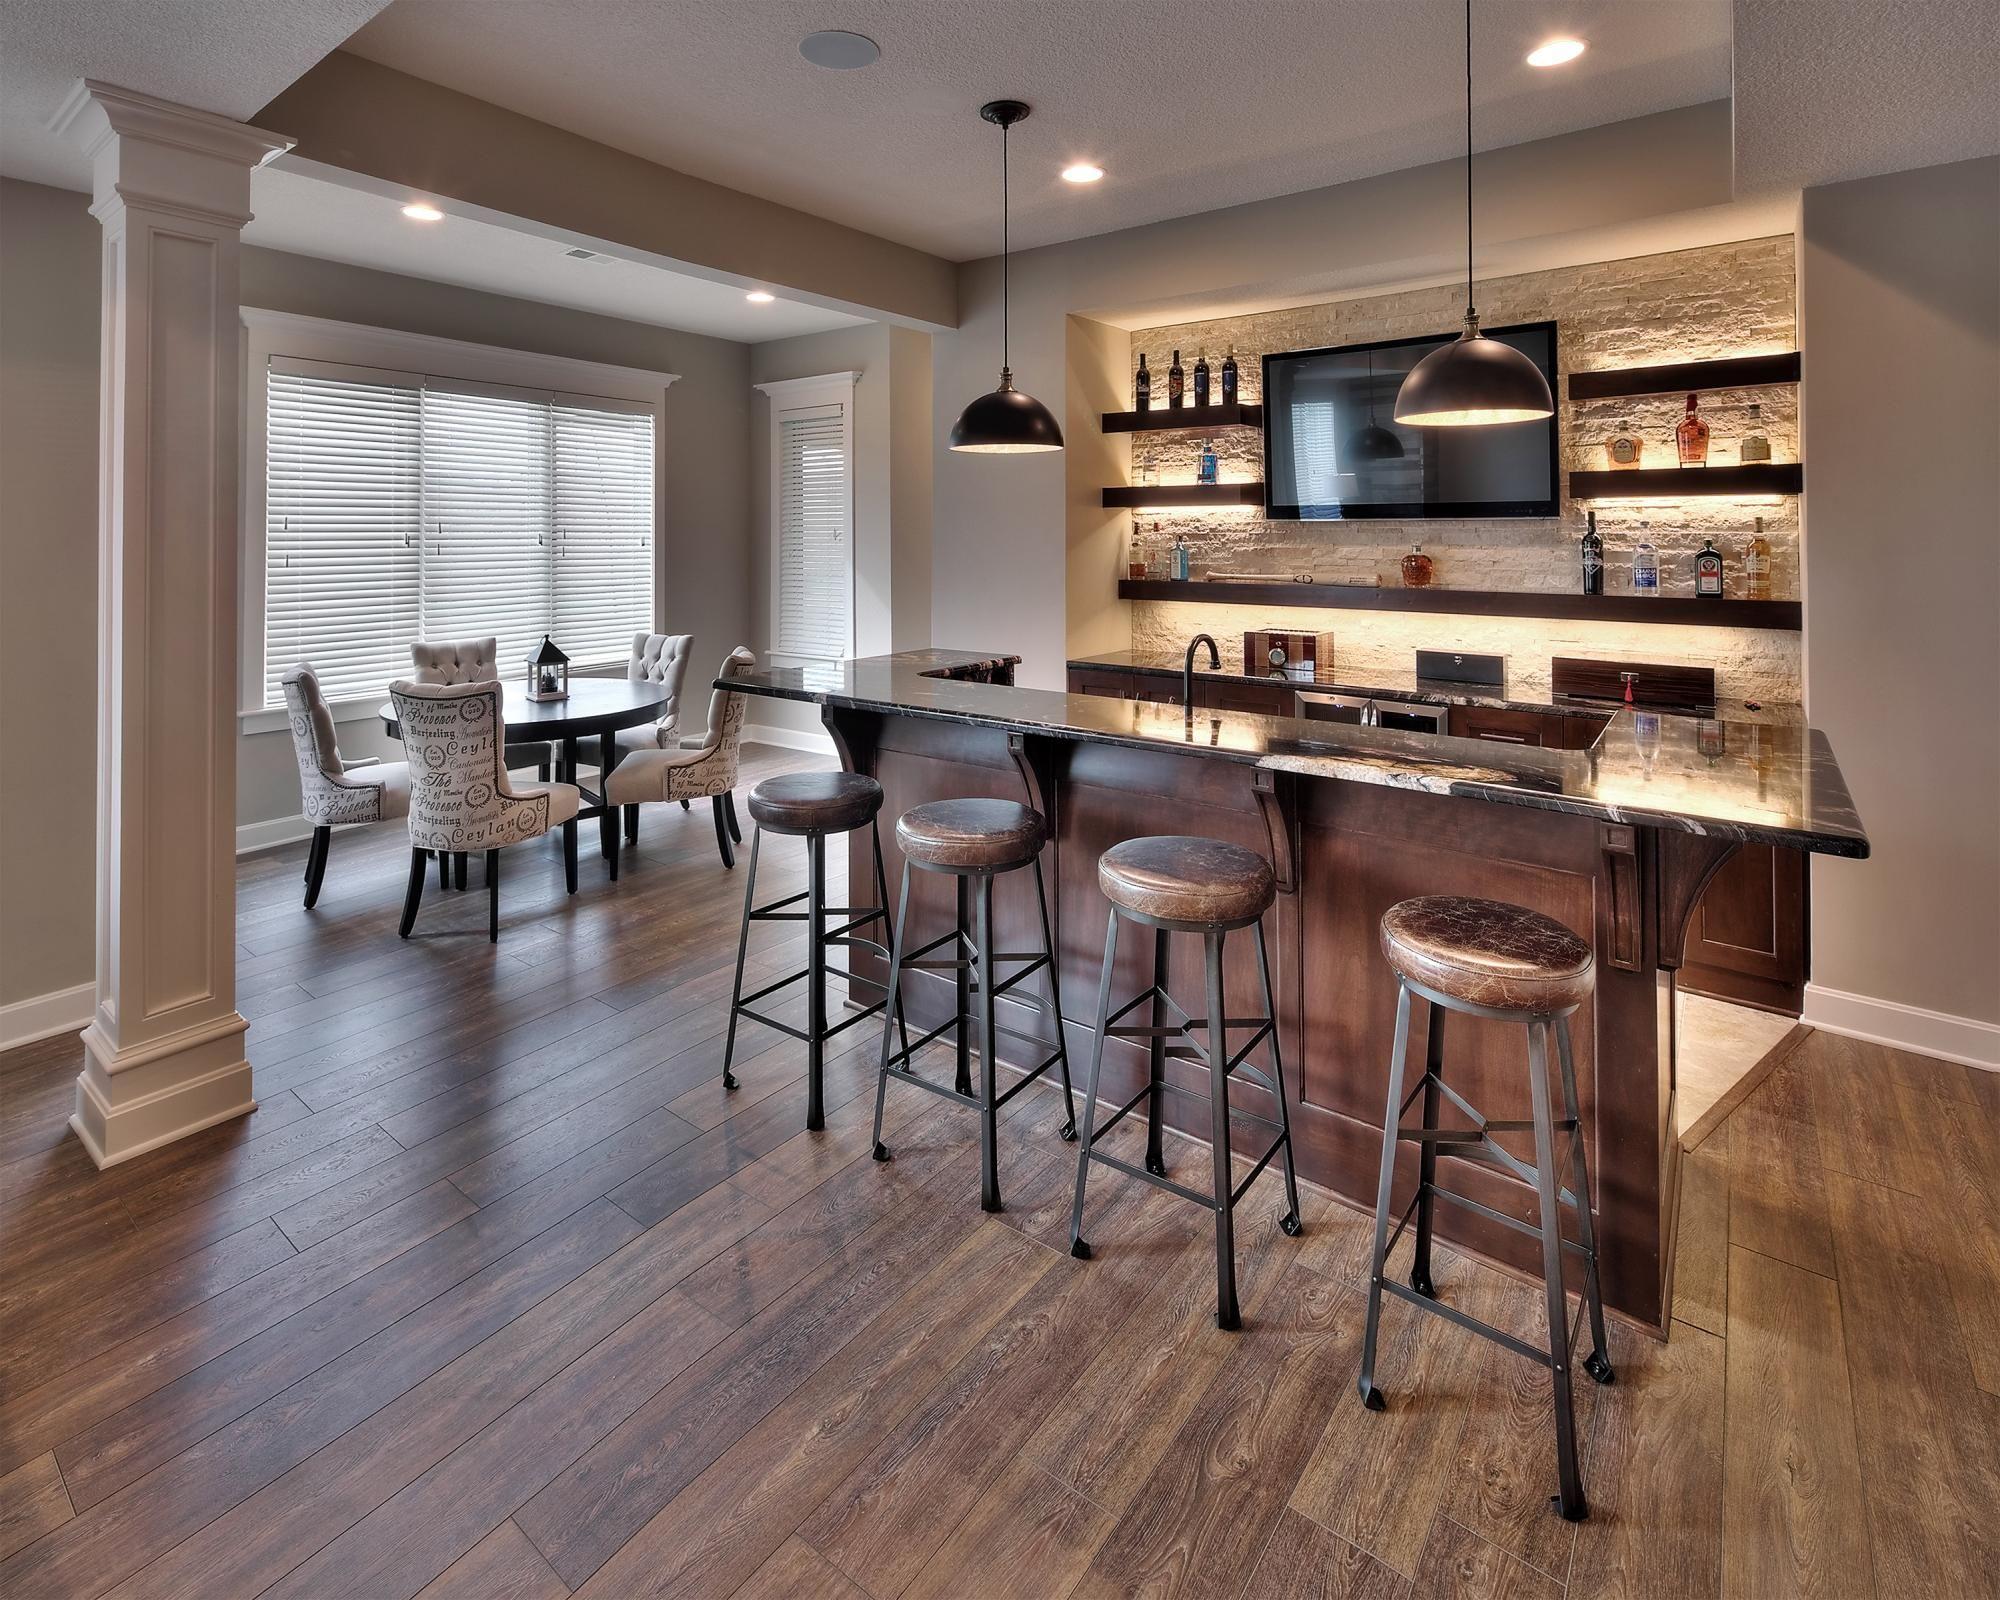 Basements Photo Gallery | Custom Homes in Kansas City KS | Starr ...